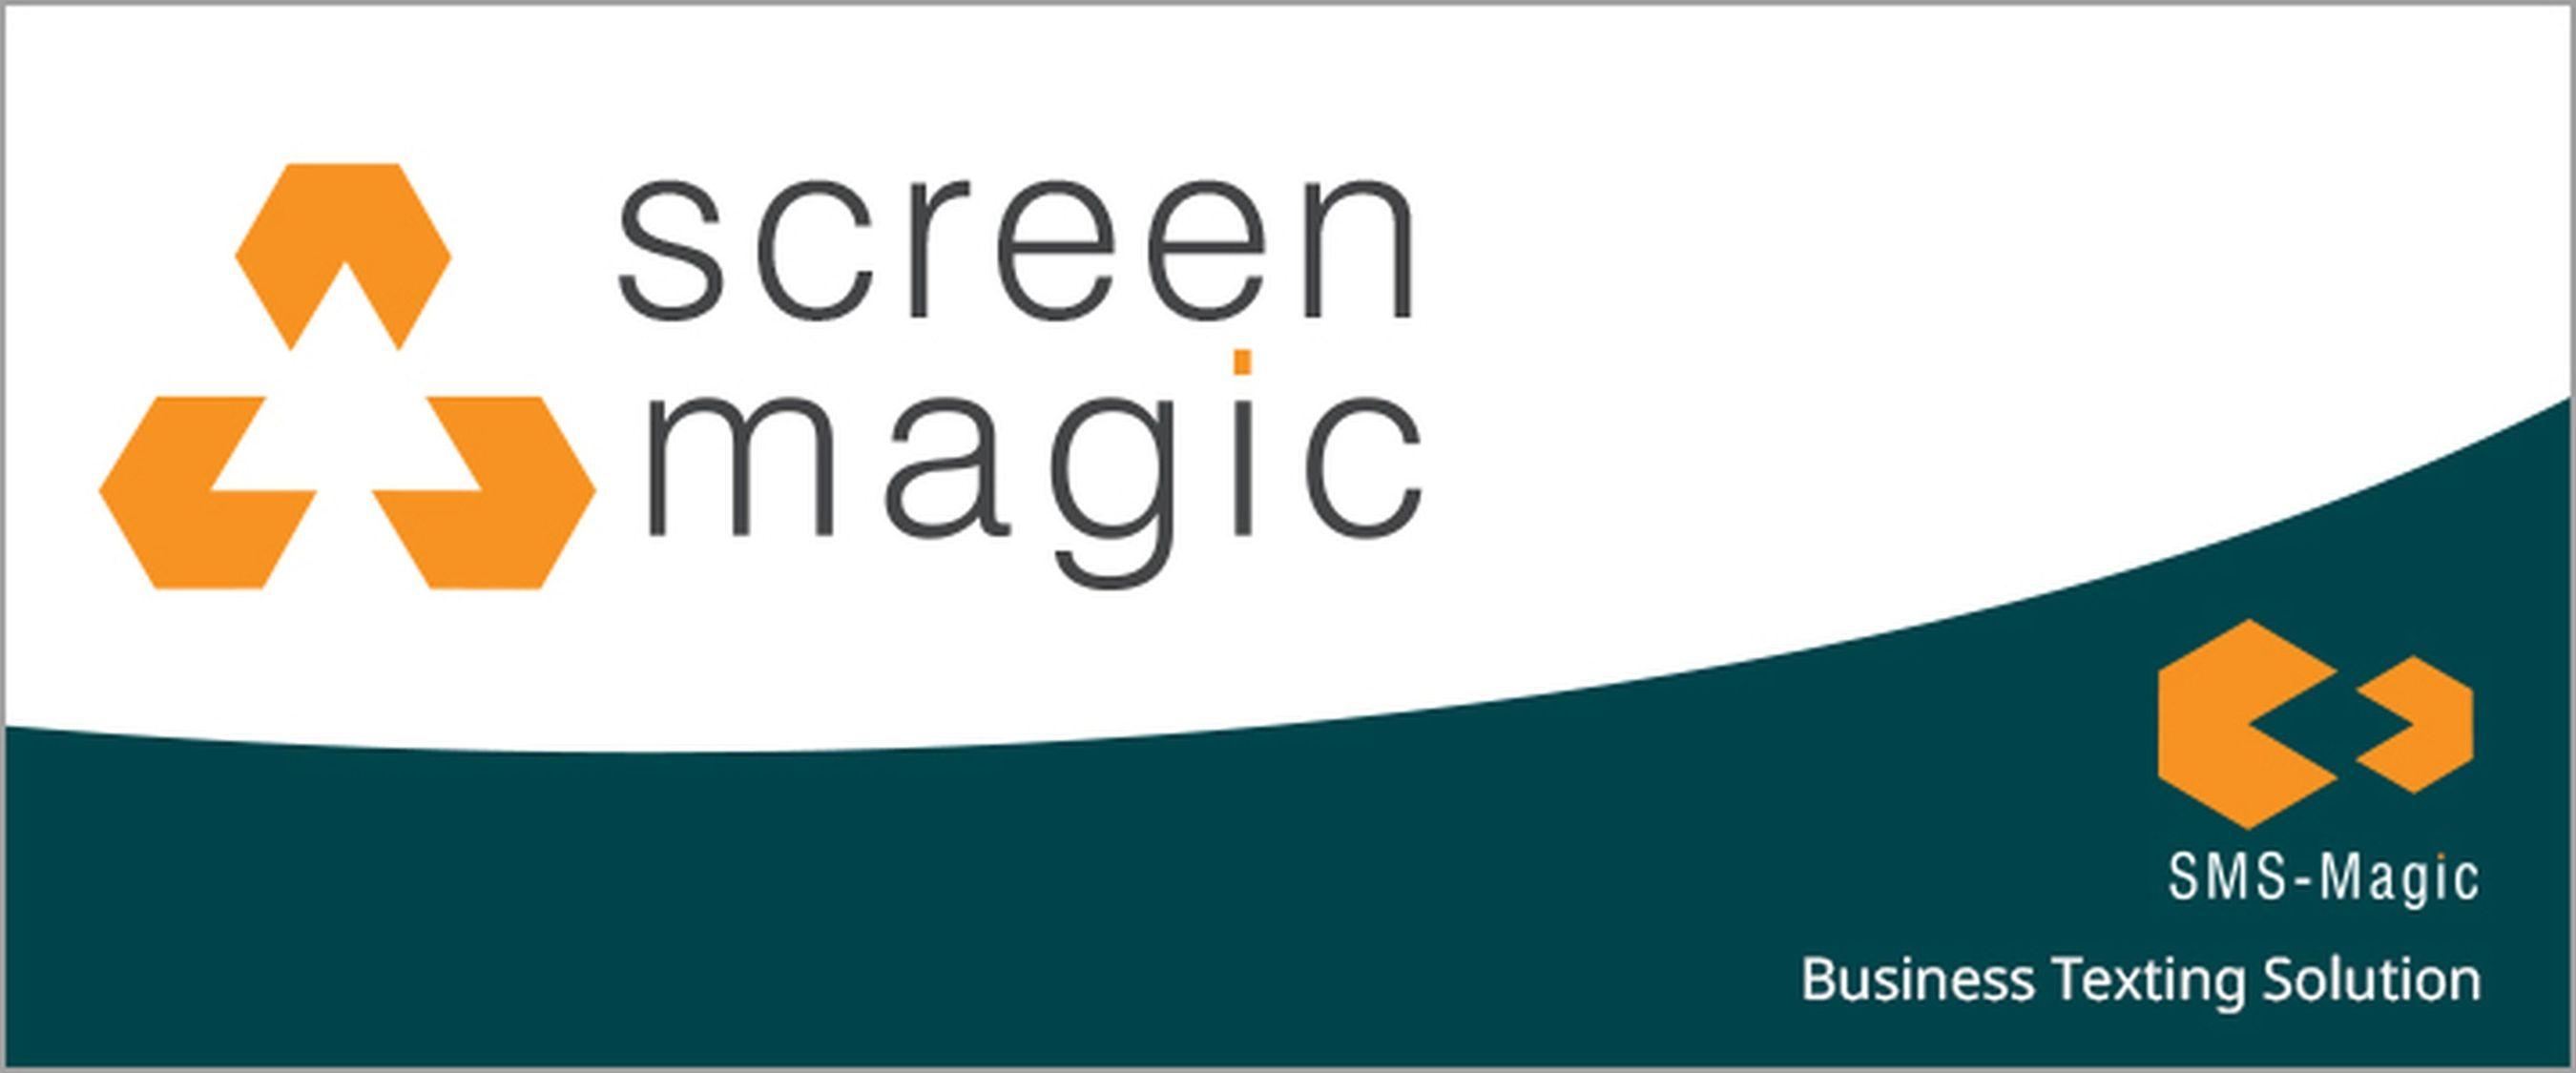 Screen-Magic Mobile Media Logo (PRNewsFoto/Screen-Magic Mobile Media)